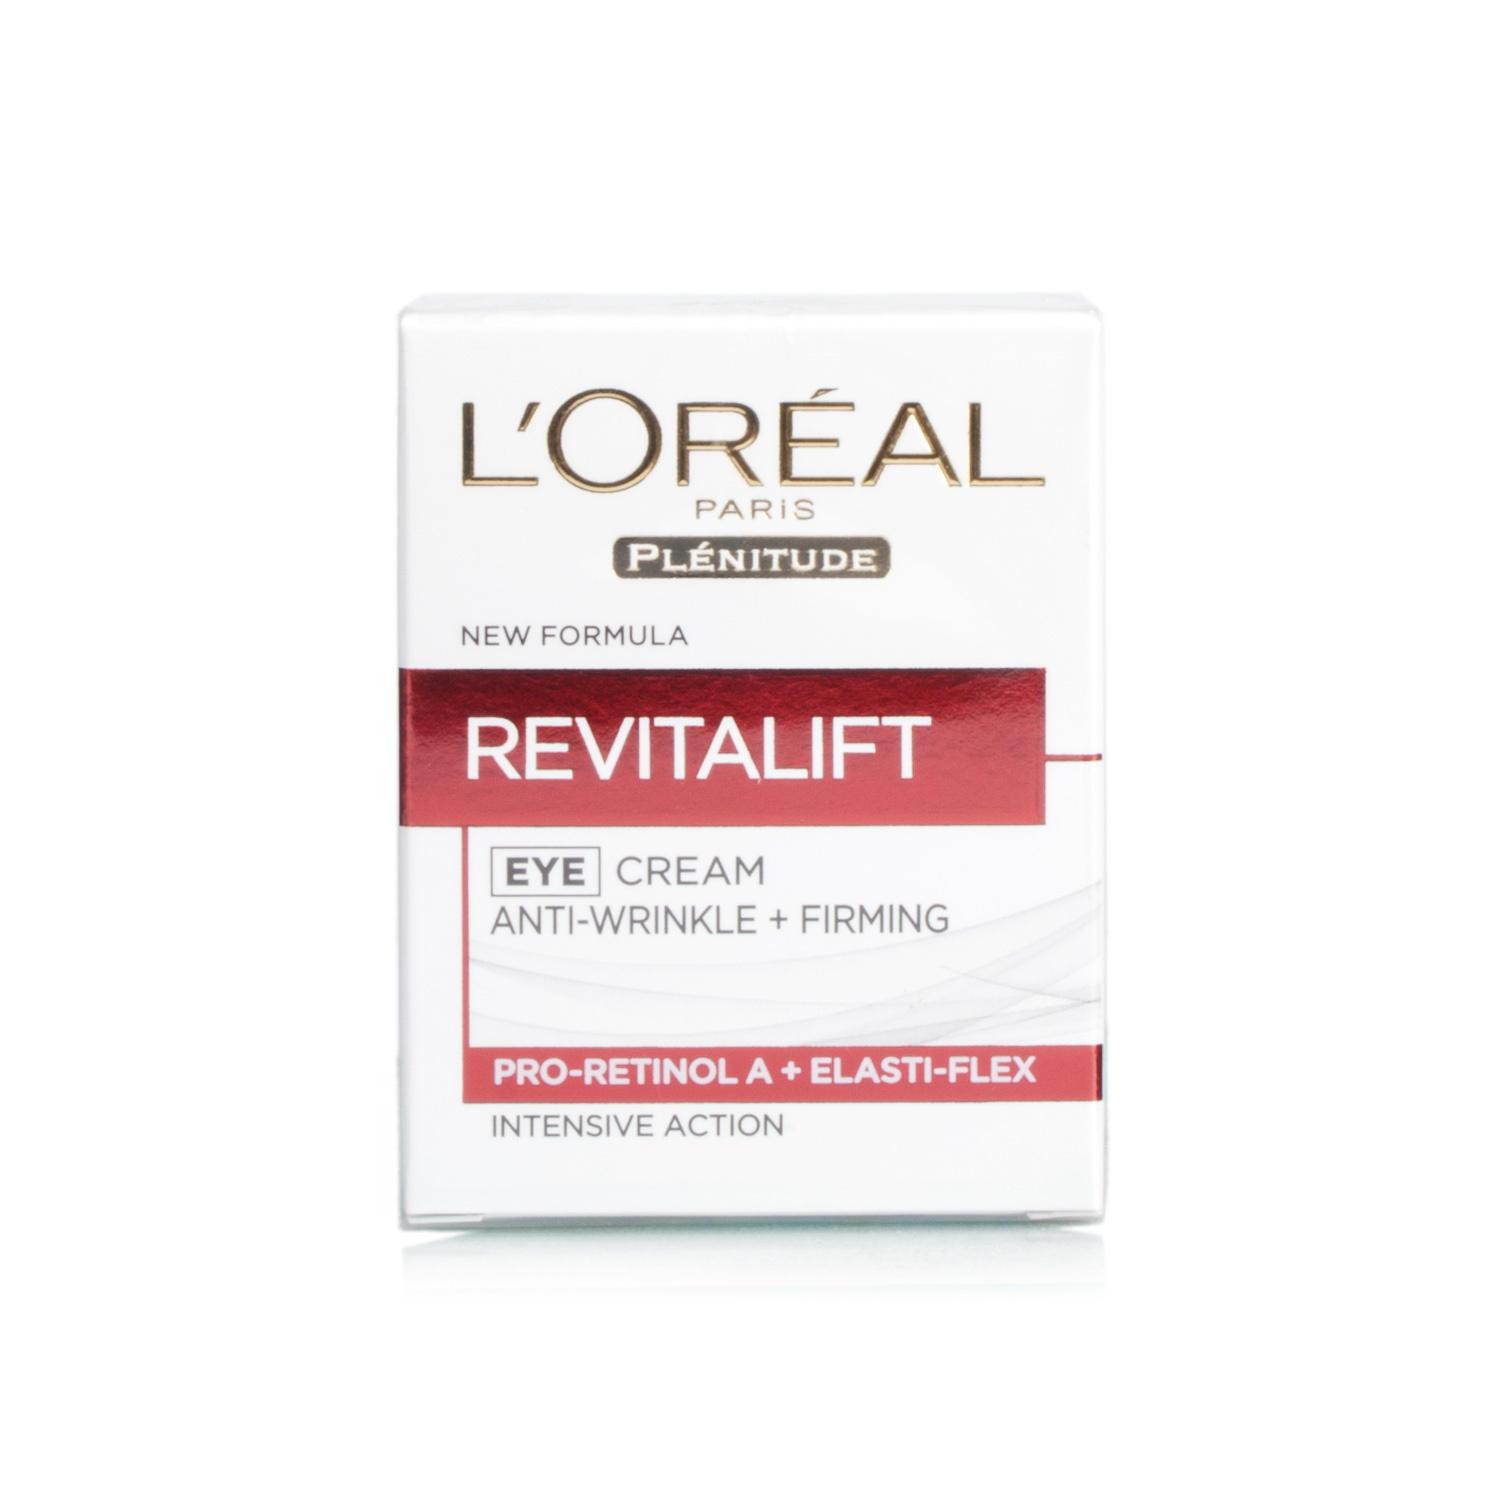 L'Oreal Paris Revitalift Eye Cream | eBay